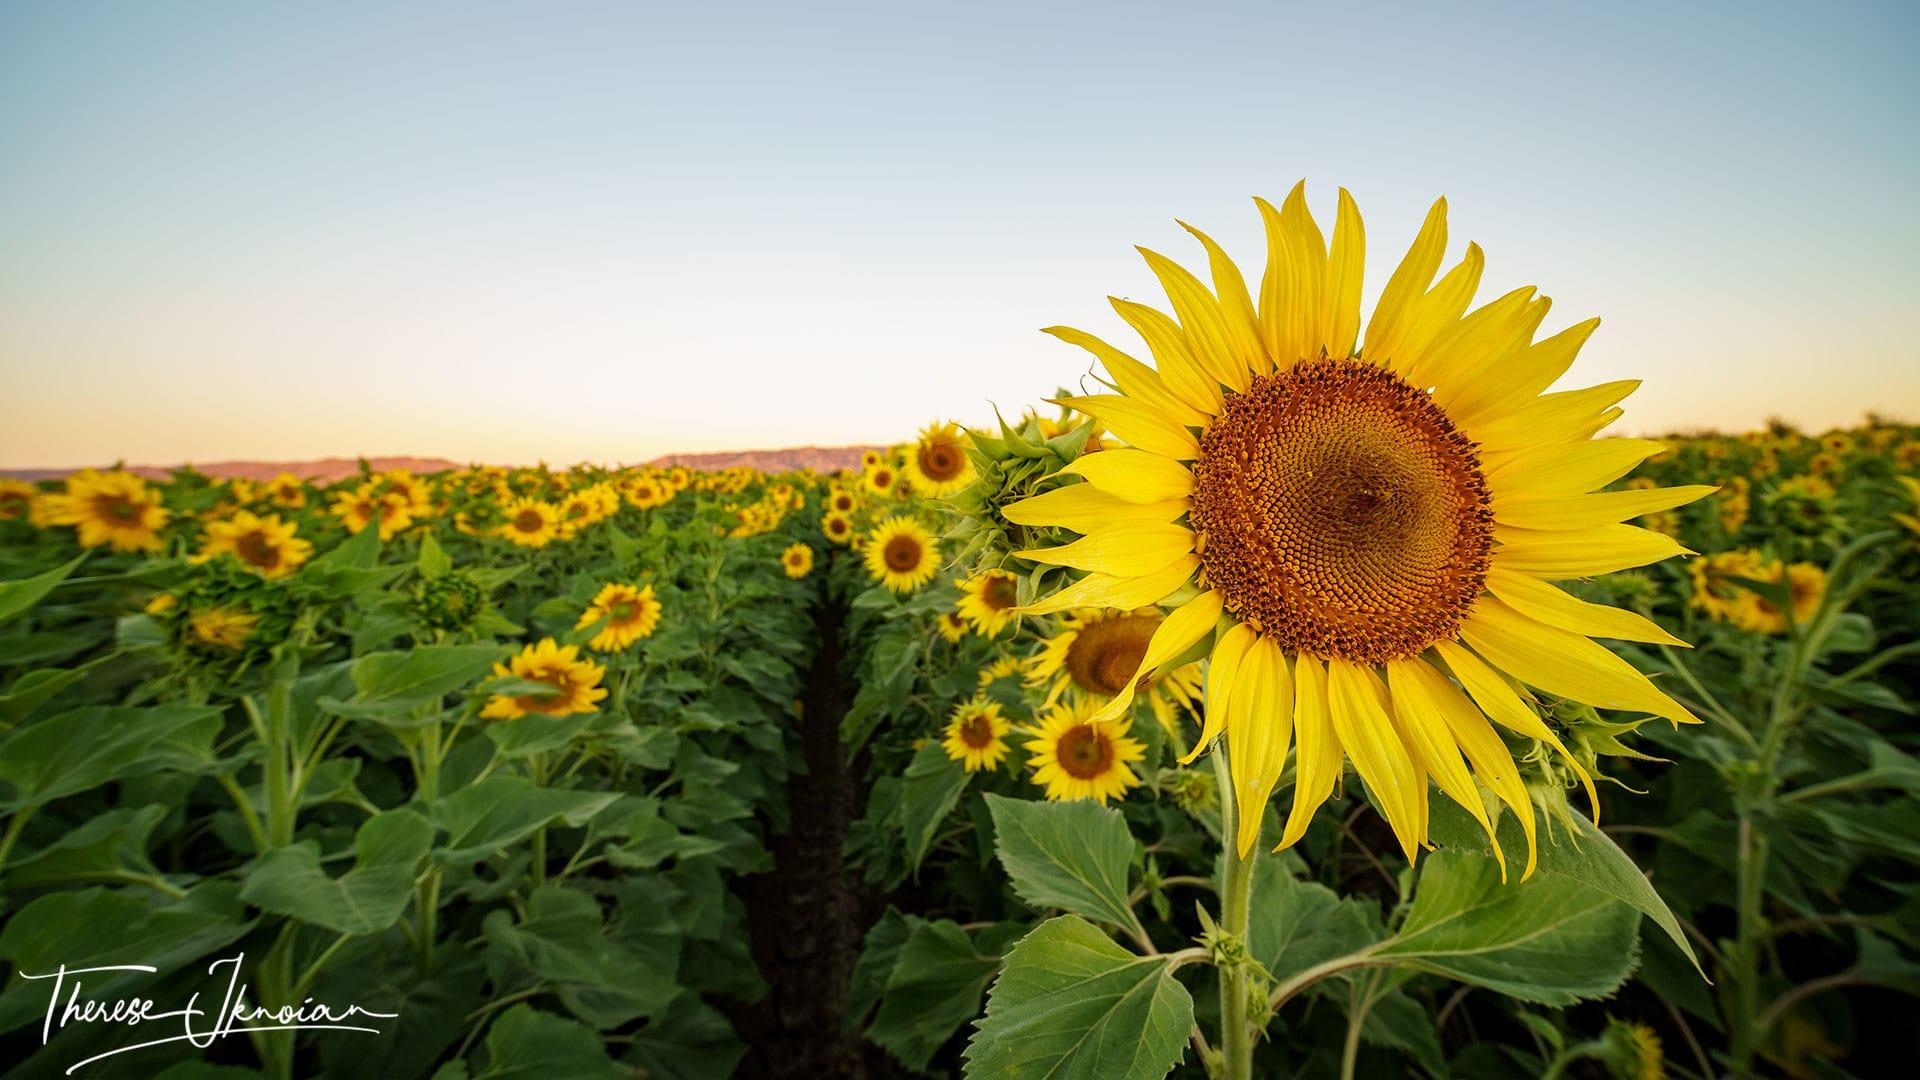 Yolo Sunflower Photo Gallery